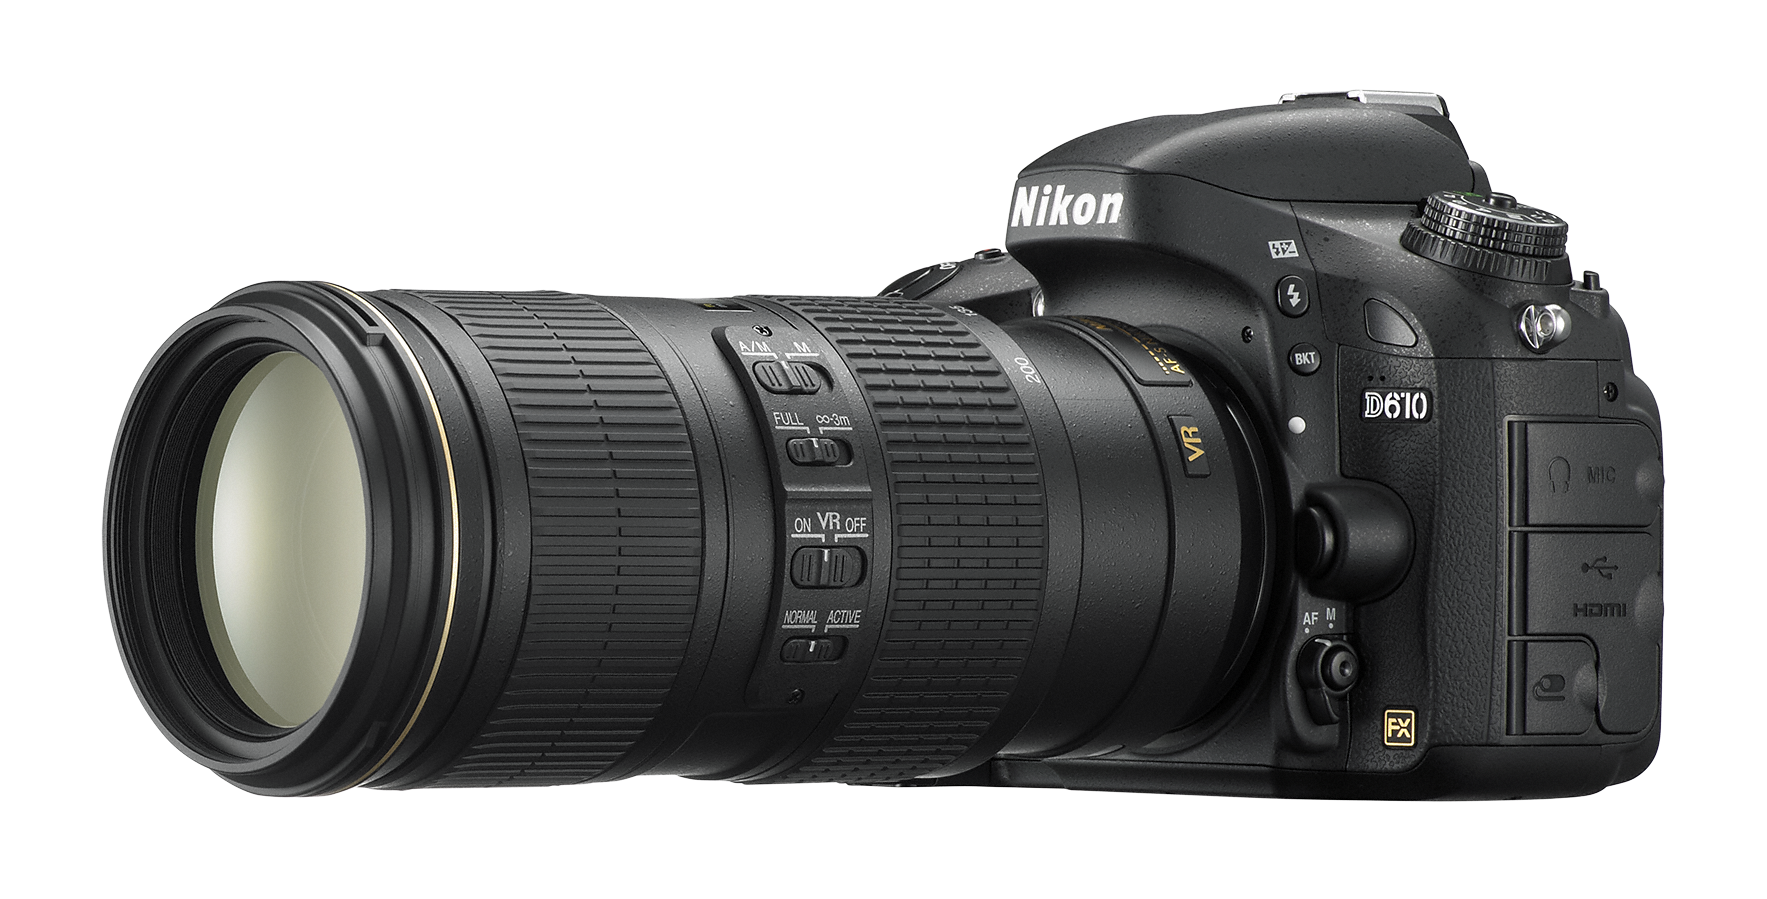 D610_70_200.png - Nikon, Transparent background PNG HD thumbnail